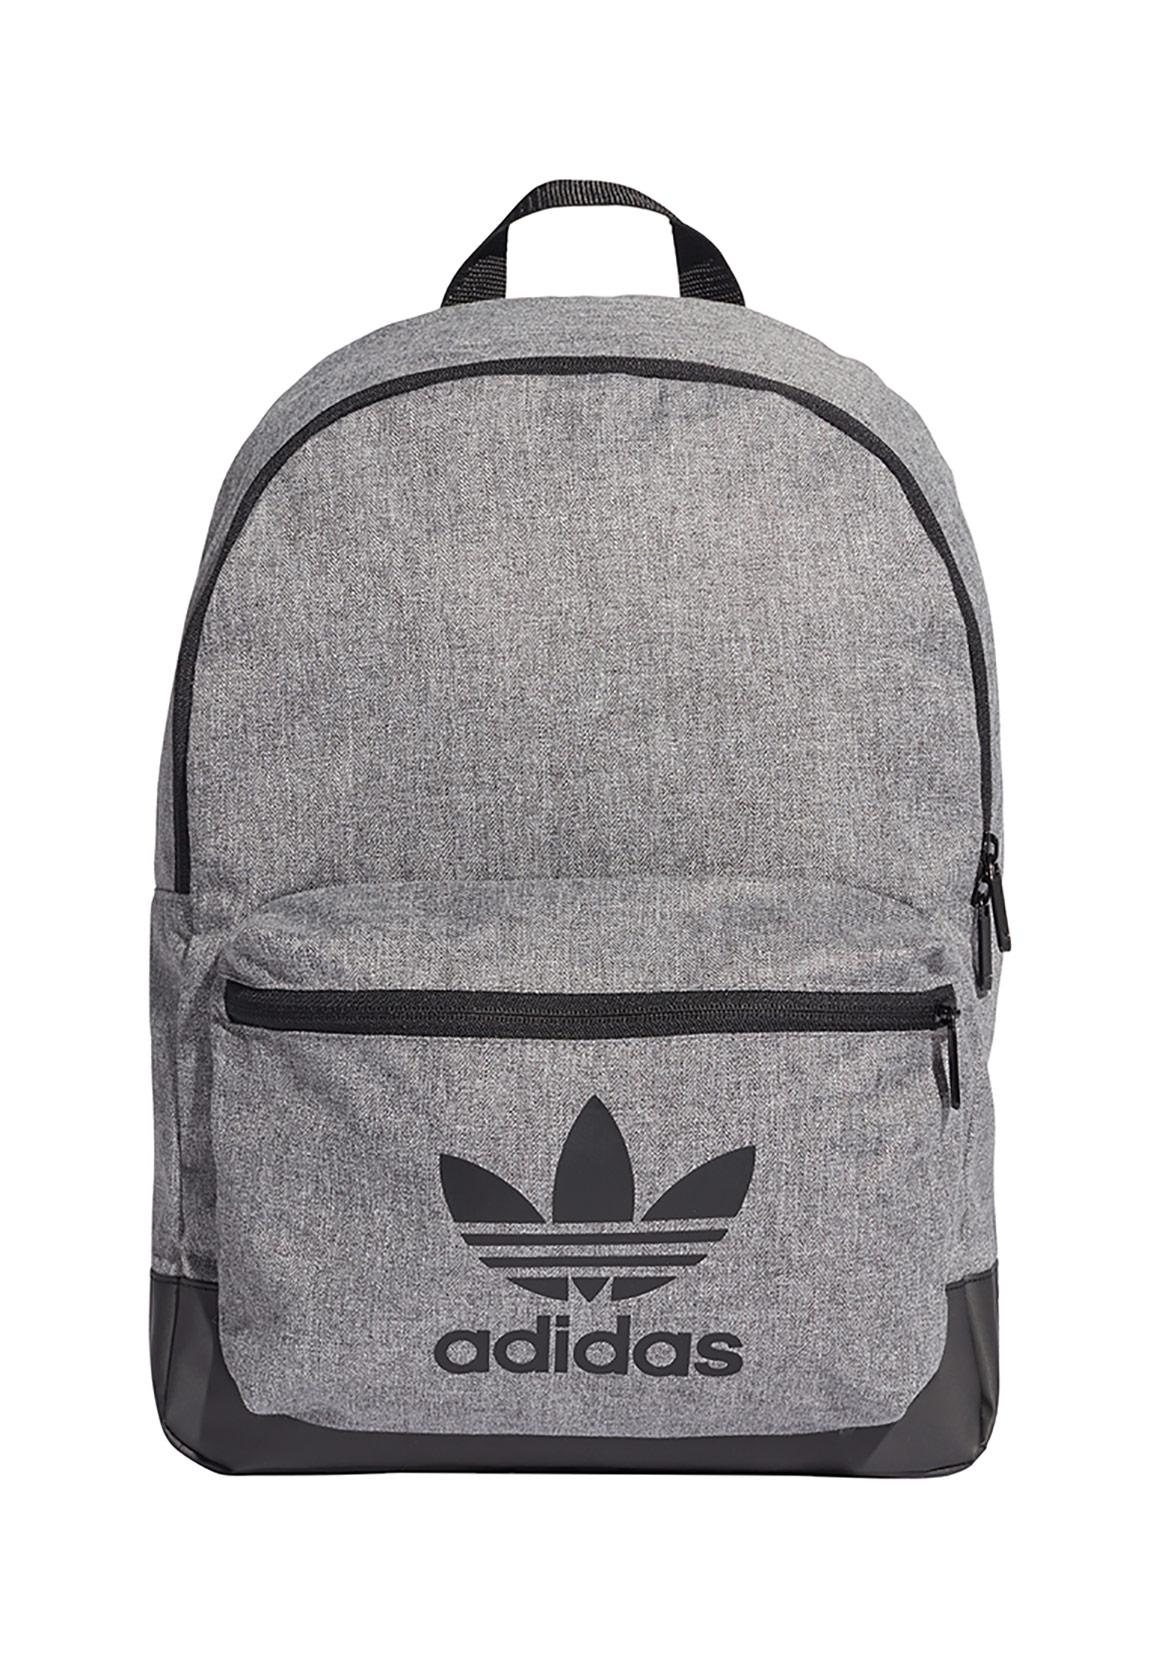 Adidas Originals Rucksack MEL CLASSIC BP ED8686 Grau